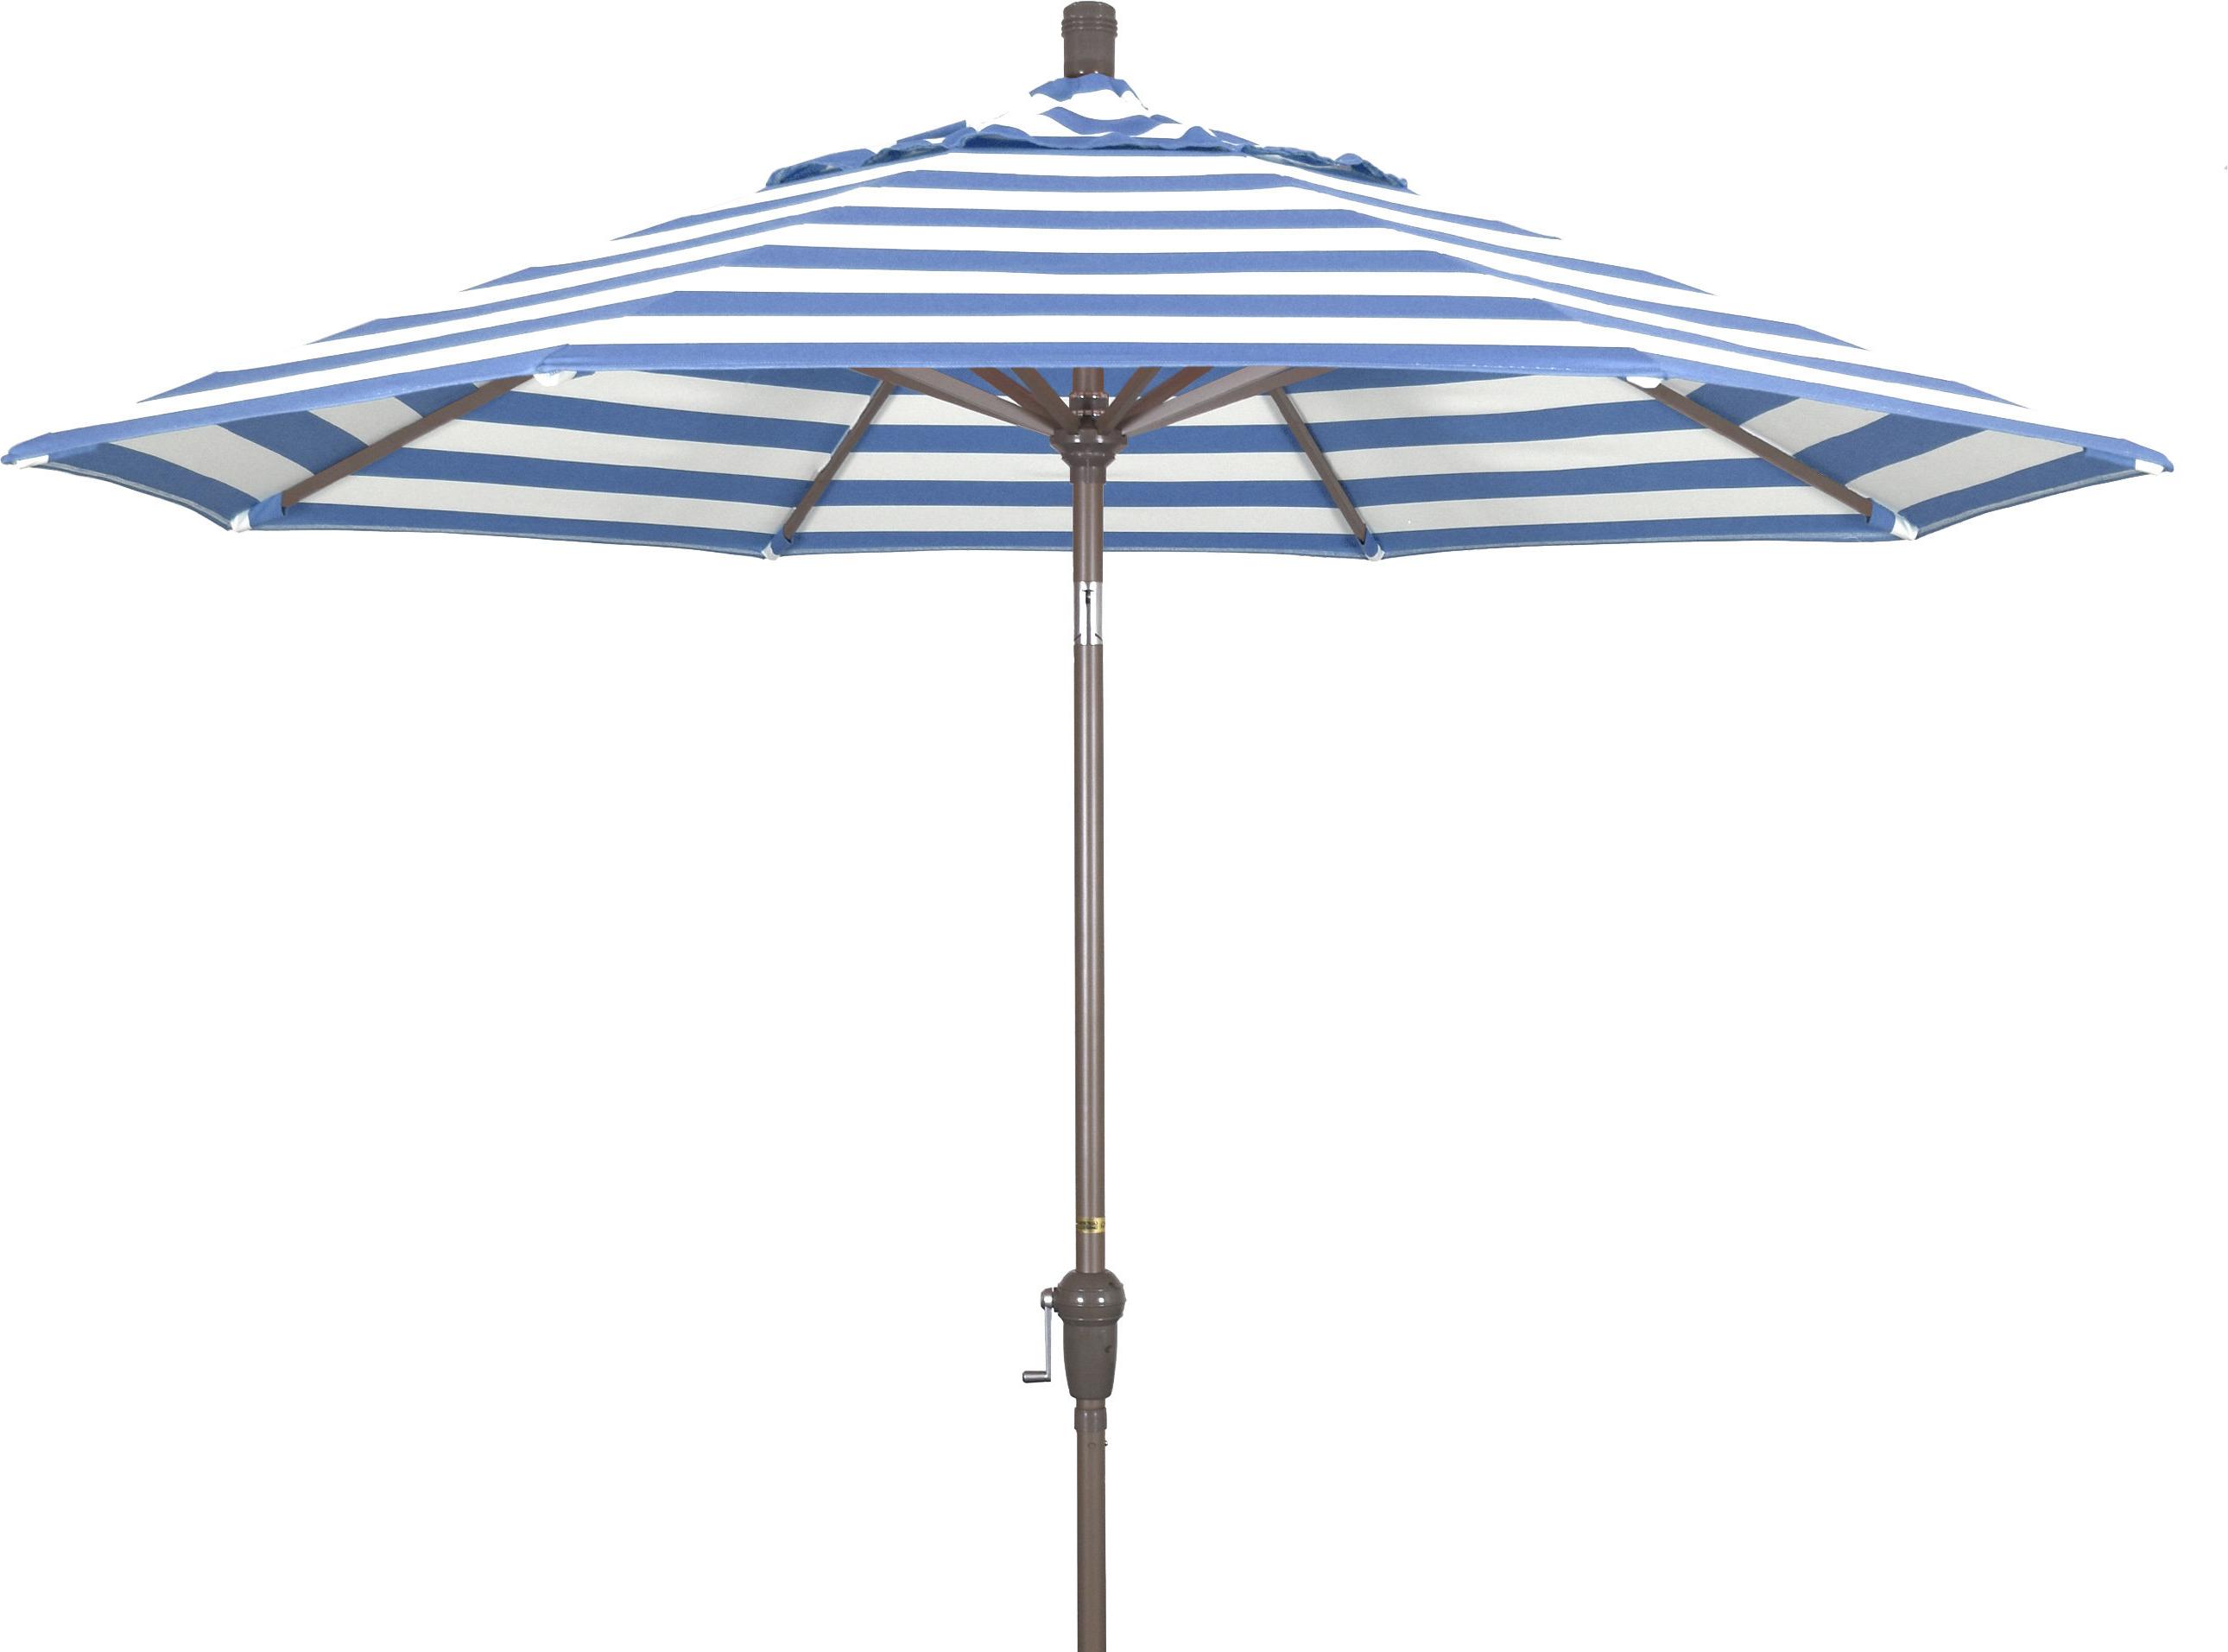 Mullaney Market Sunbrella Umbrellas For 2020 9' Market Sunbrella Umbrella (View 10 of 20)